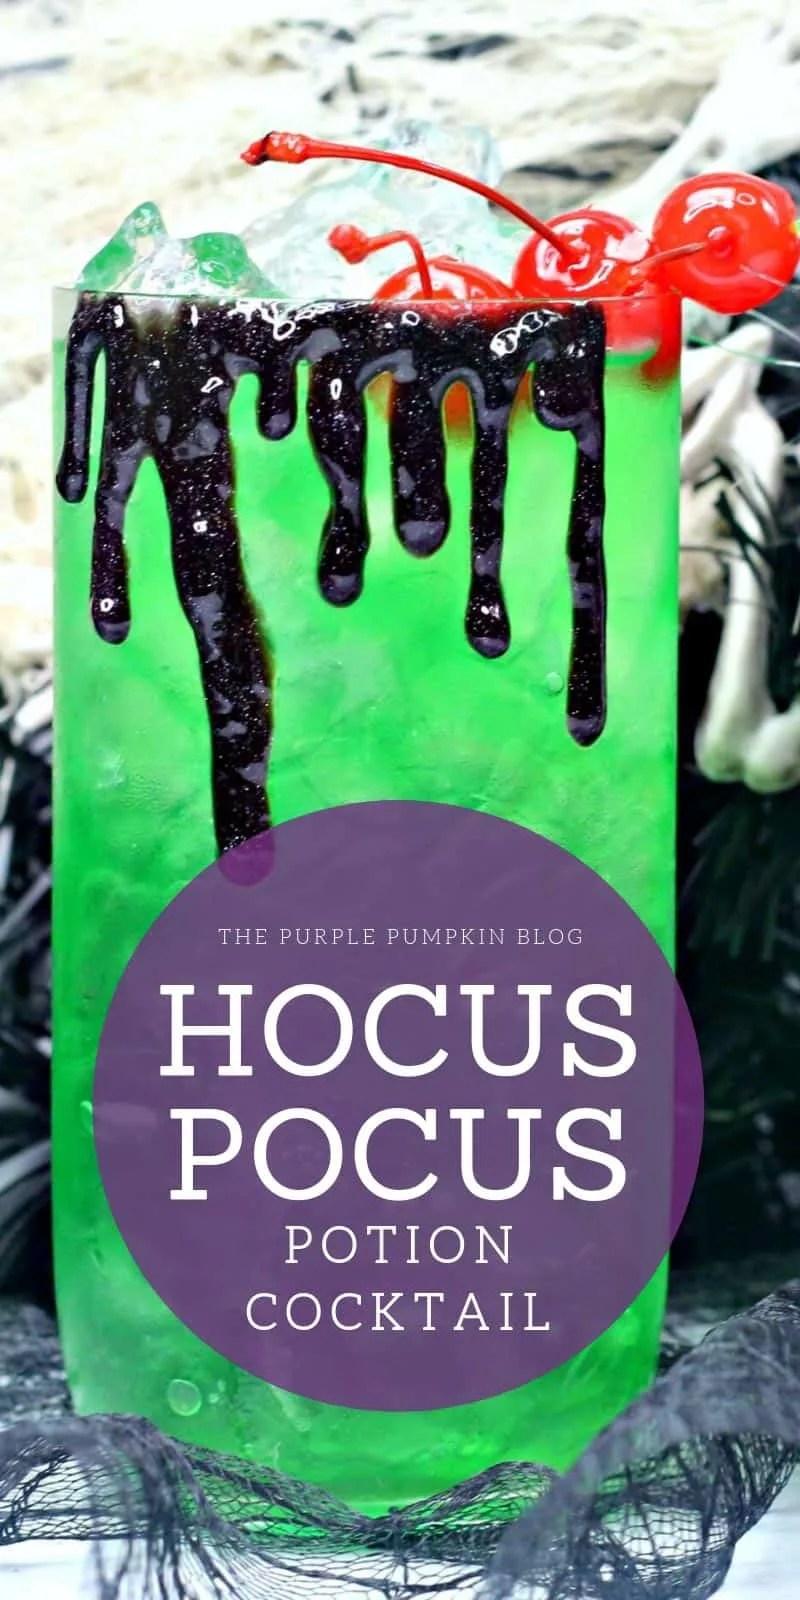 Hocus Pocus Potion Cocktail